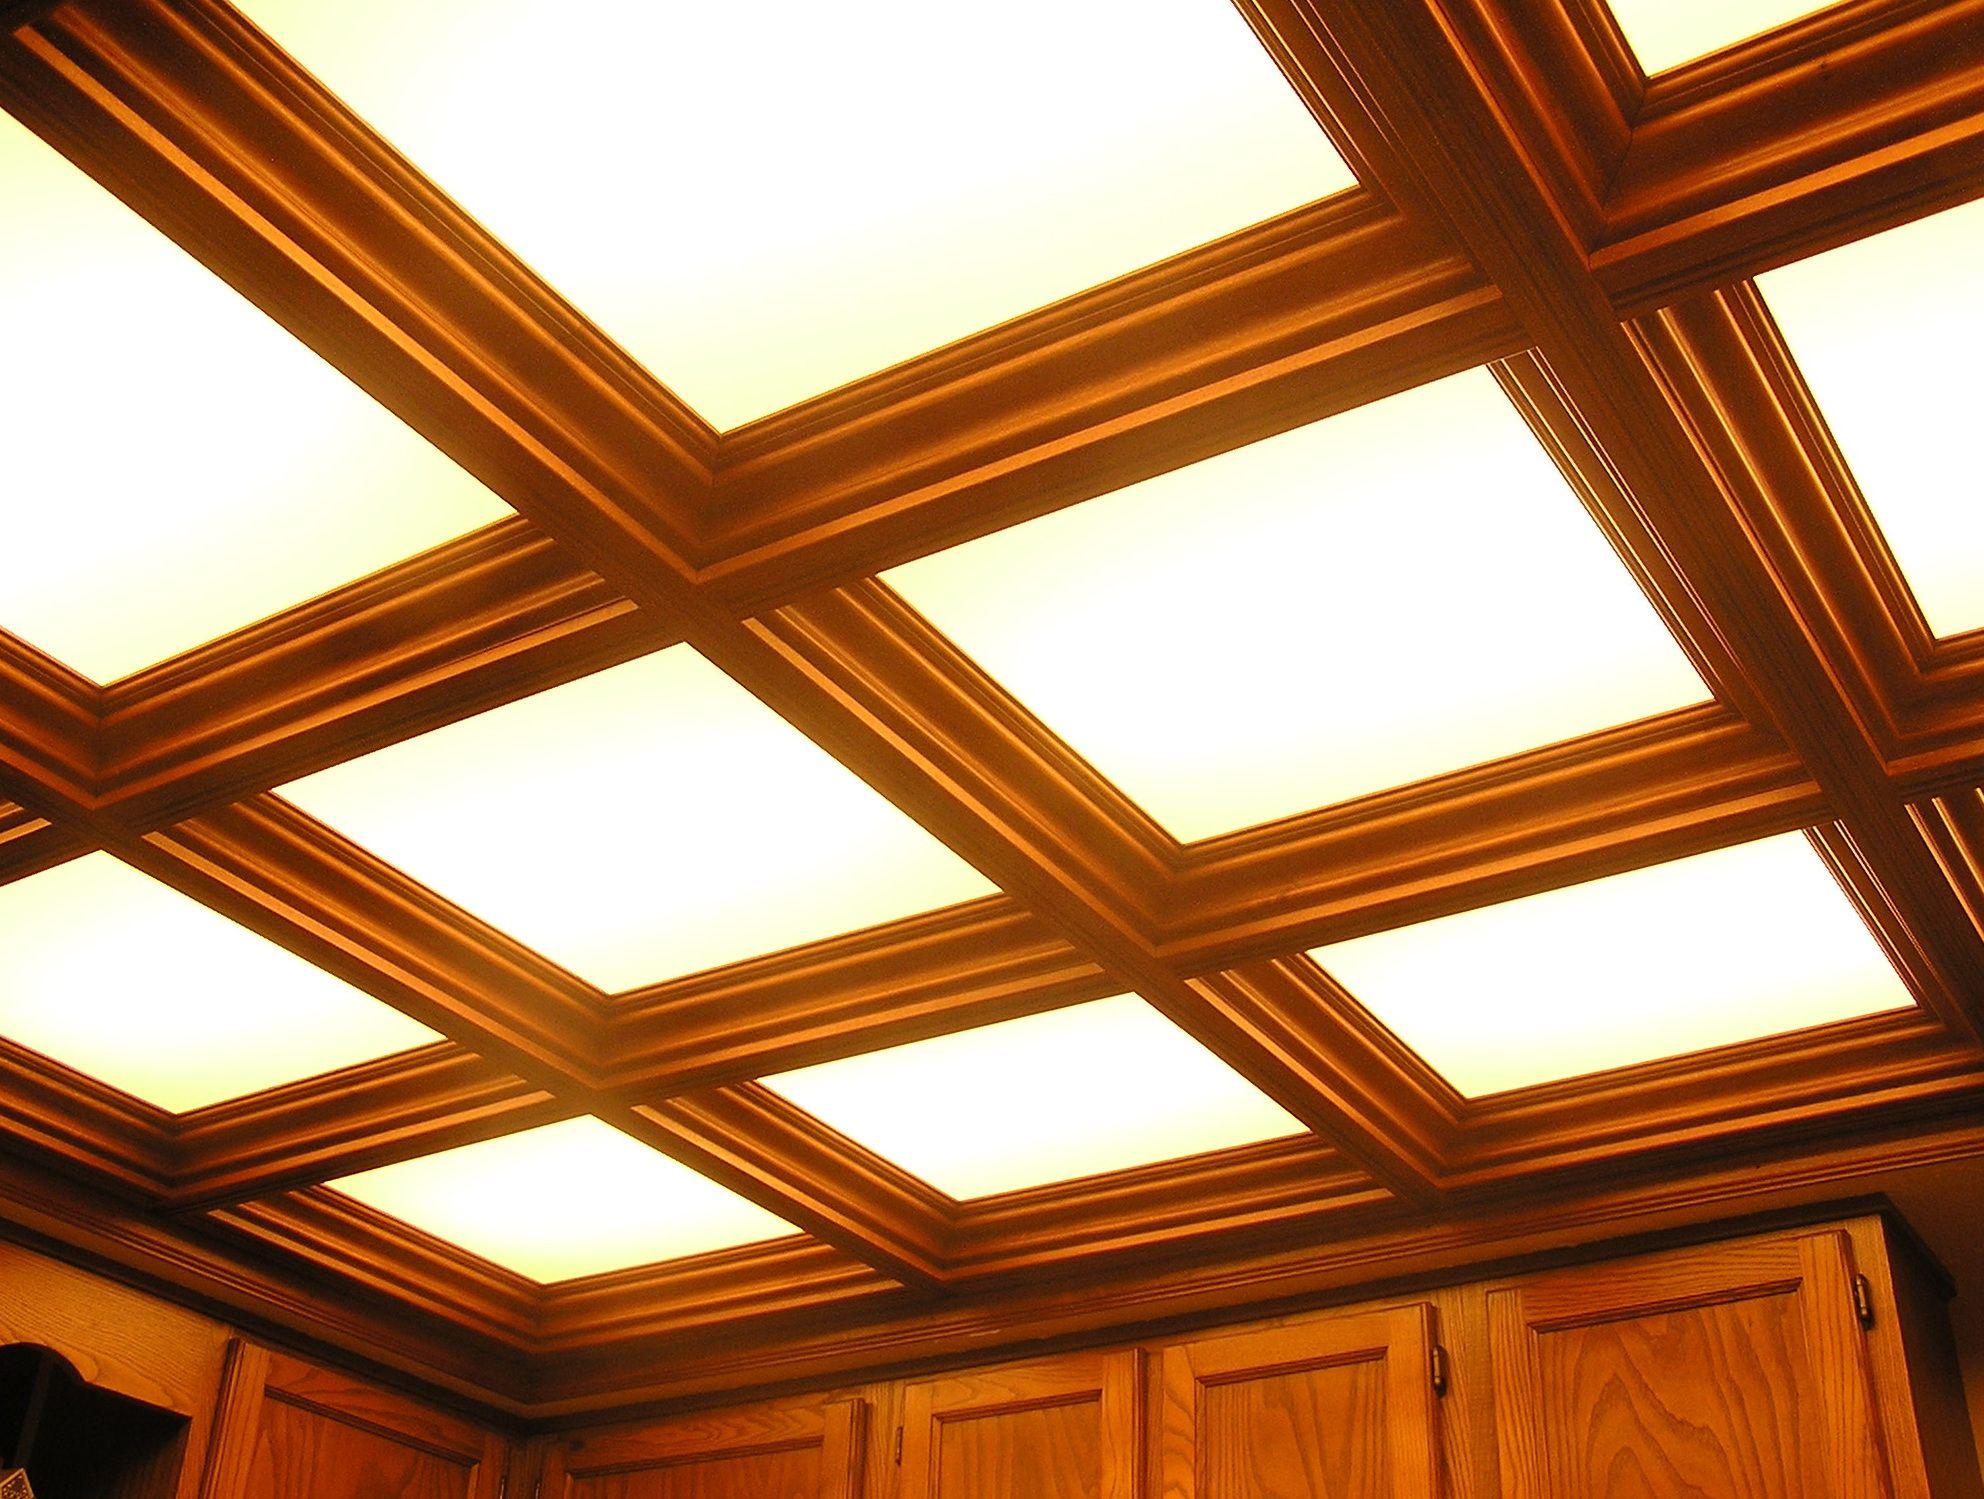 Wood Ceiling Tiles Panels | Home Design Ideas